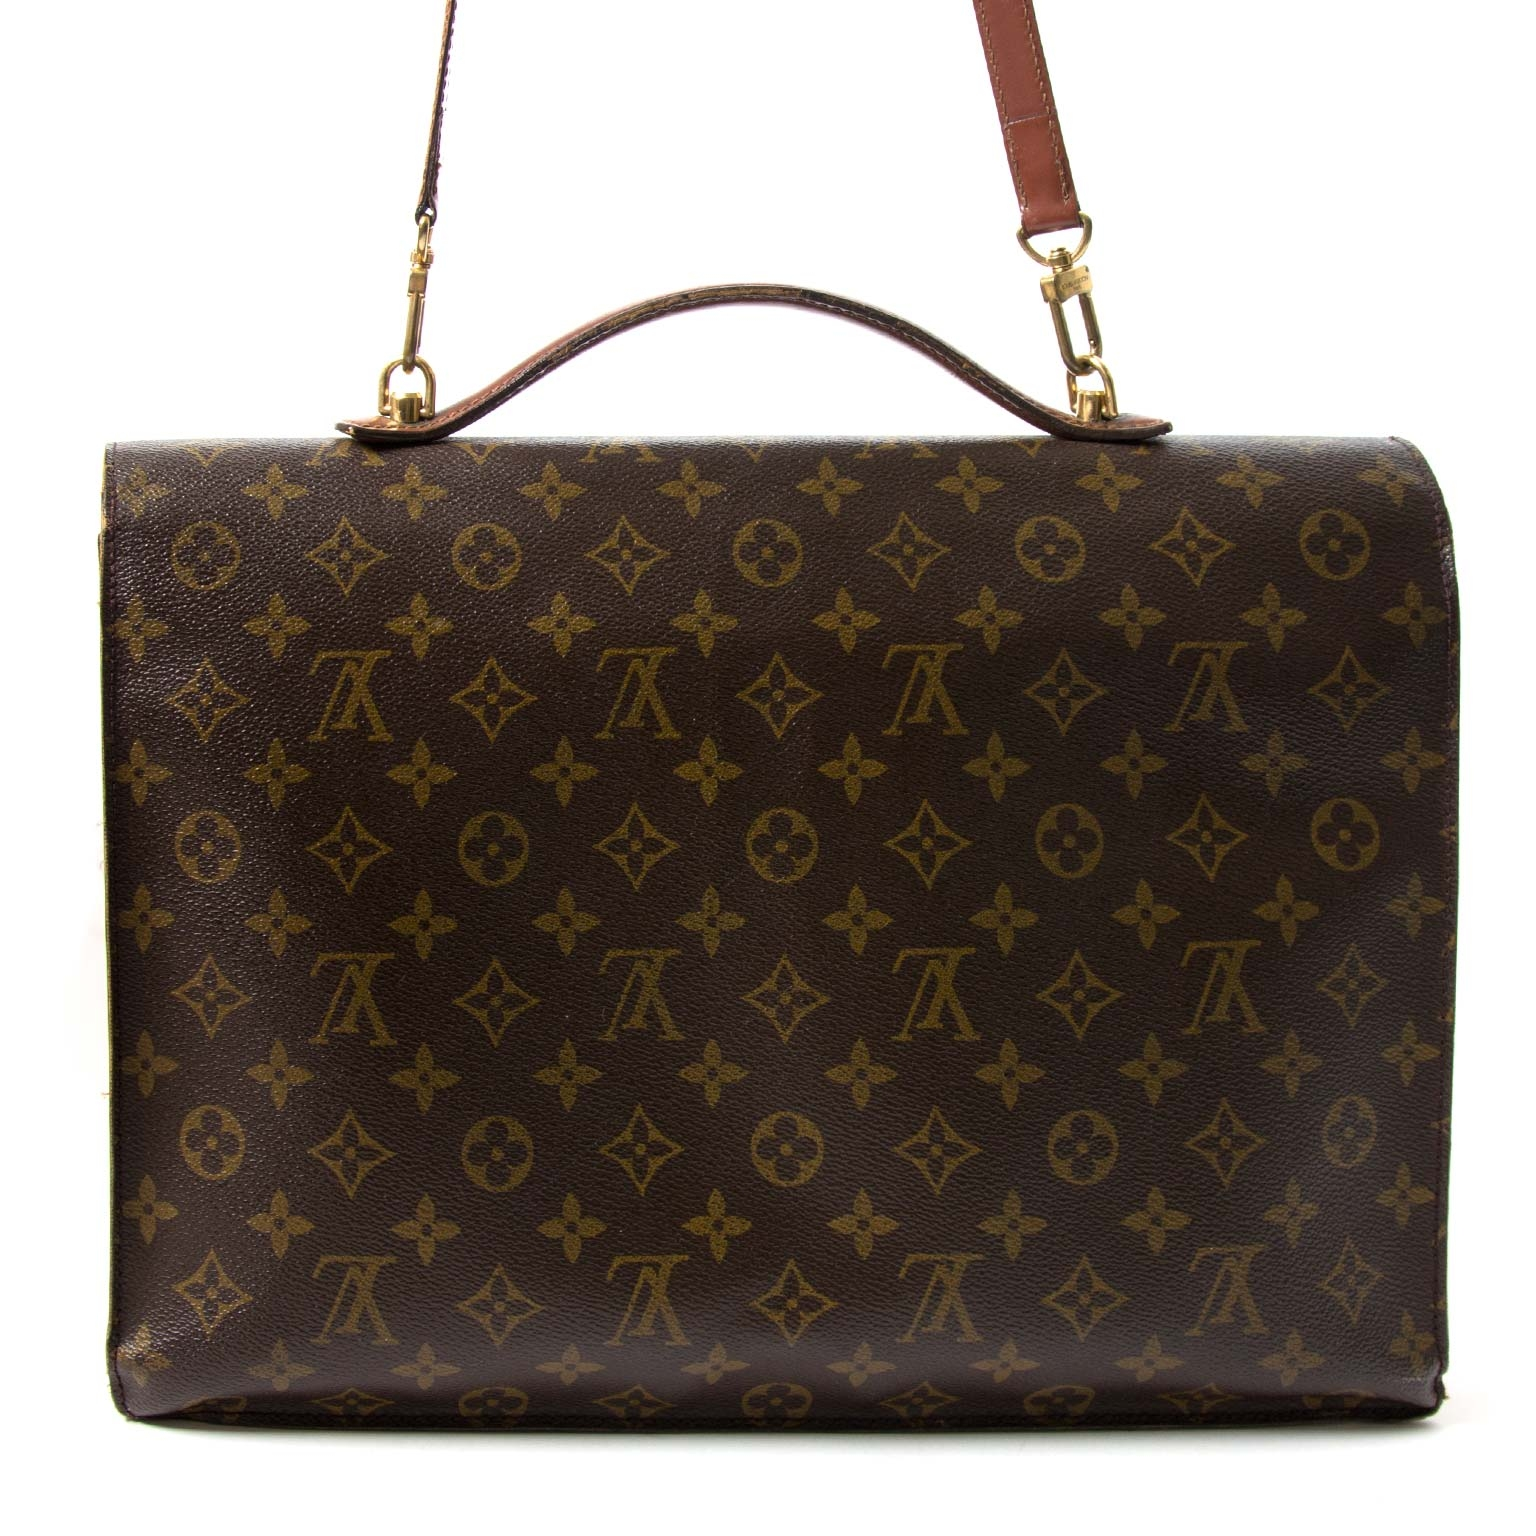 f5df6b2ec05a ... koop Louis Vuitton Monogram Laguito en betaal veilig online